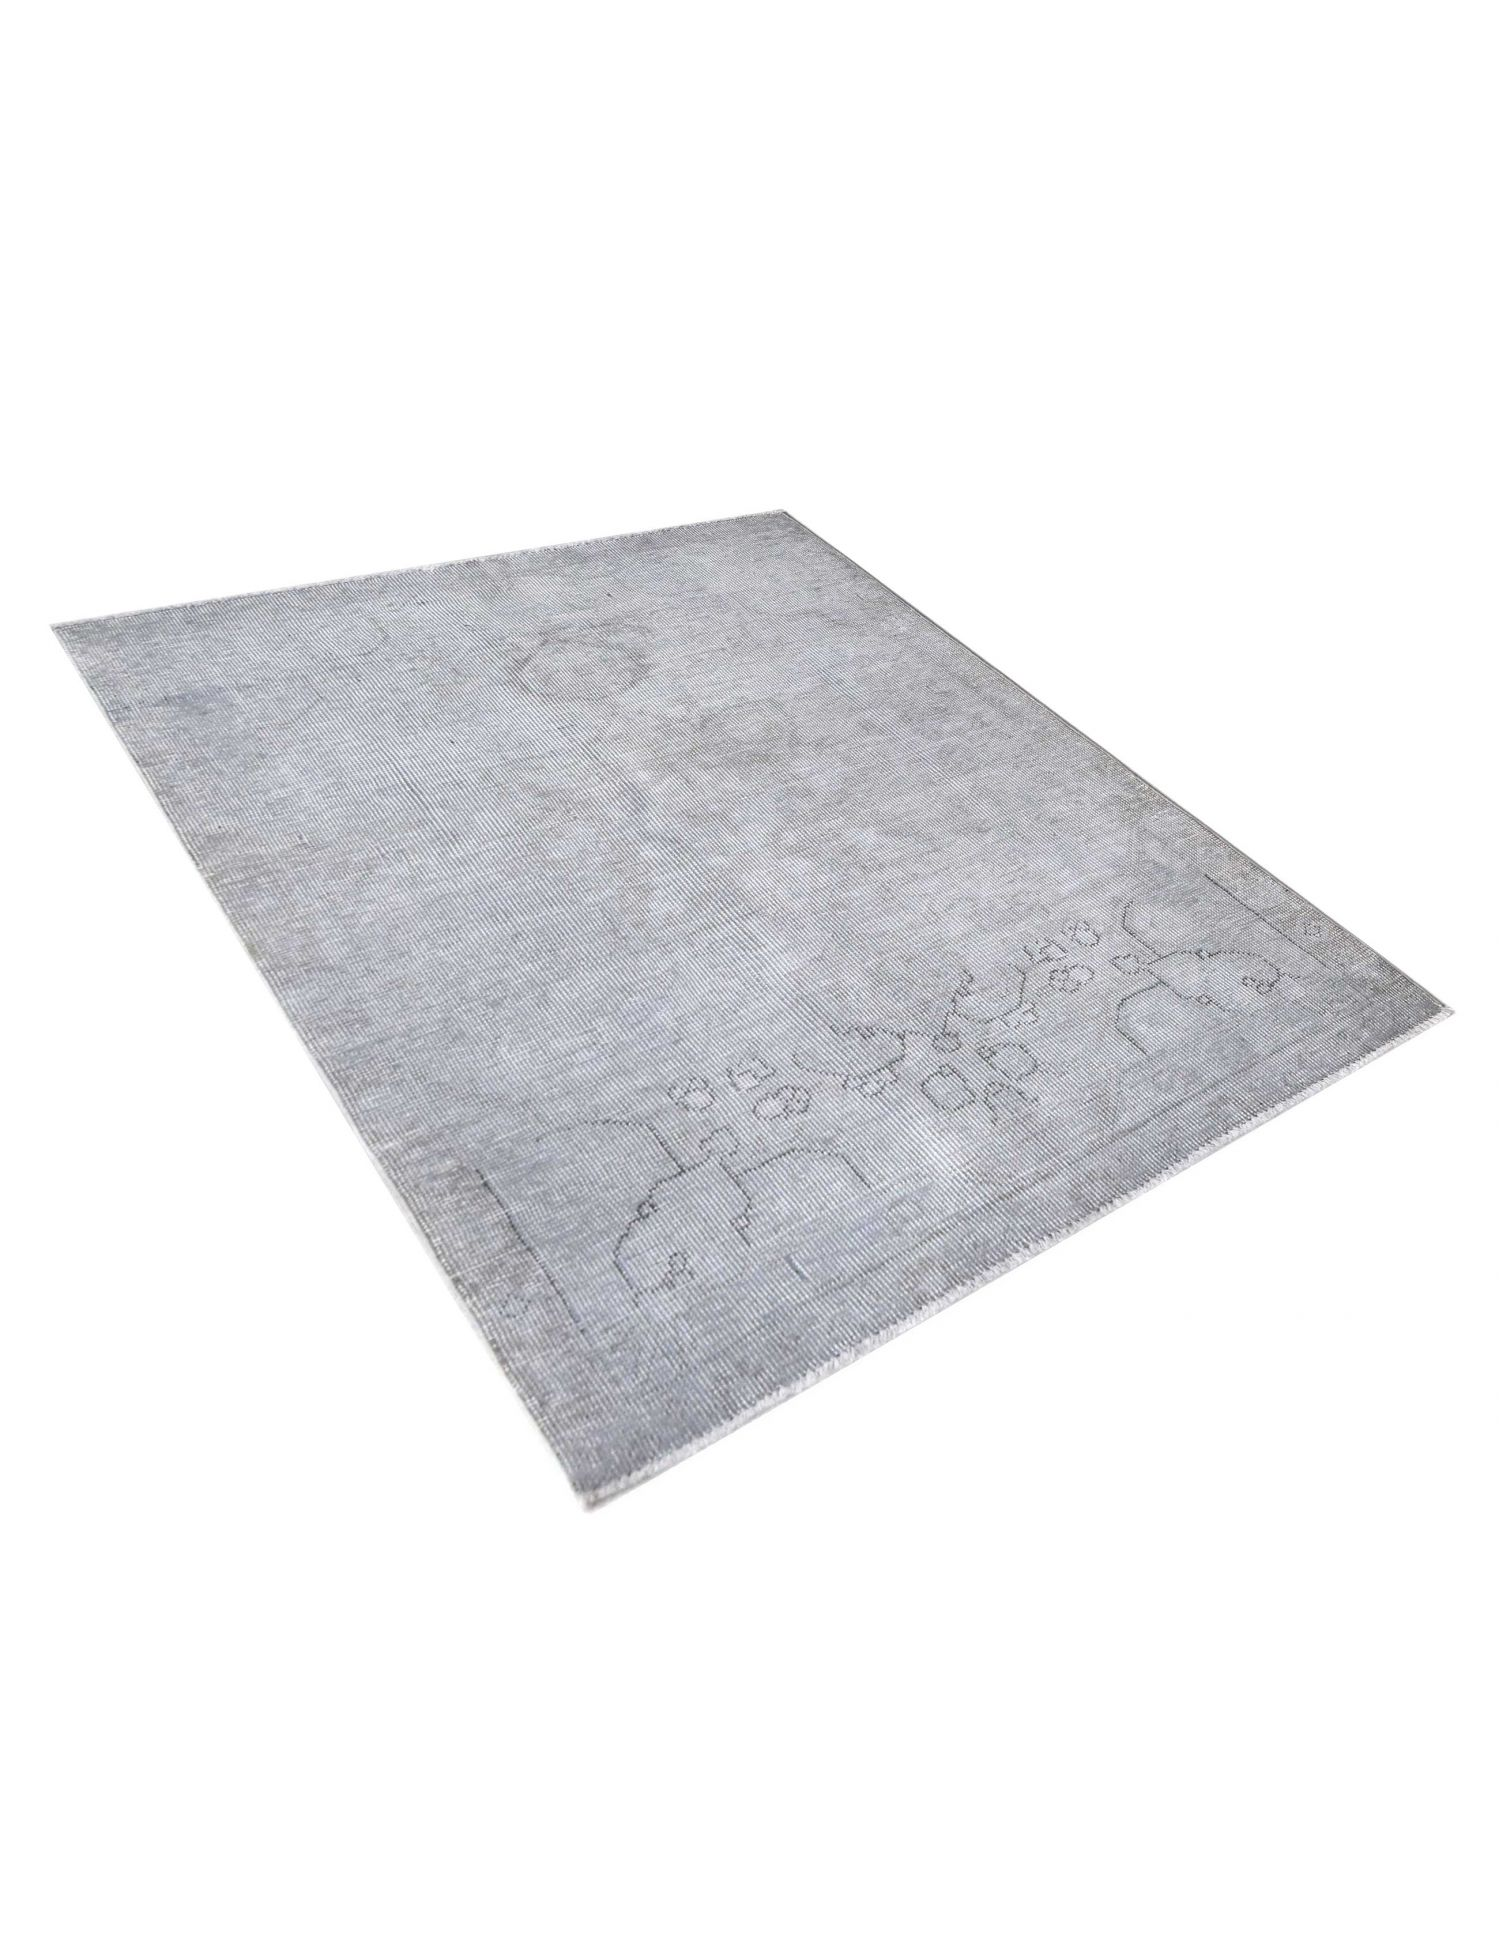 Vintage Perserteppich  grau <br/>134 x 95 cm